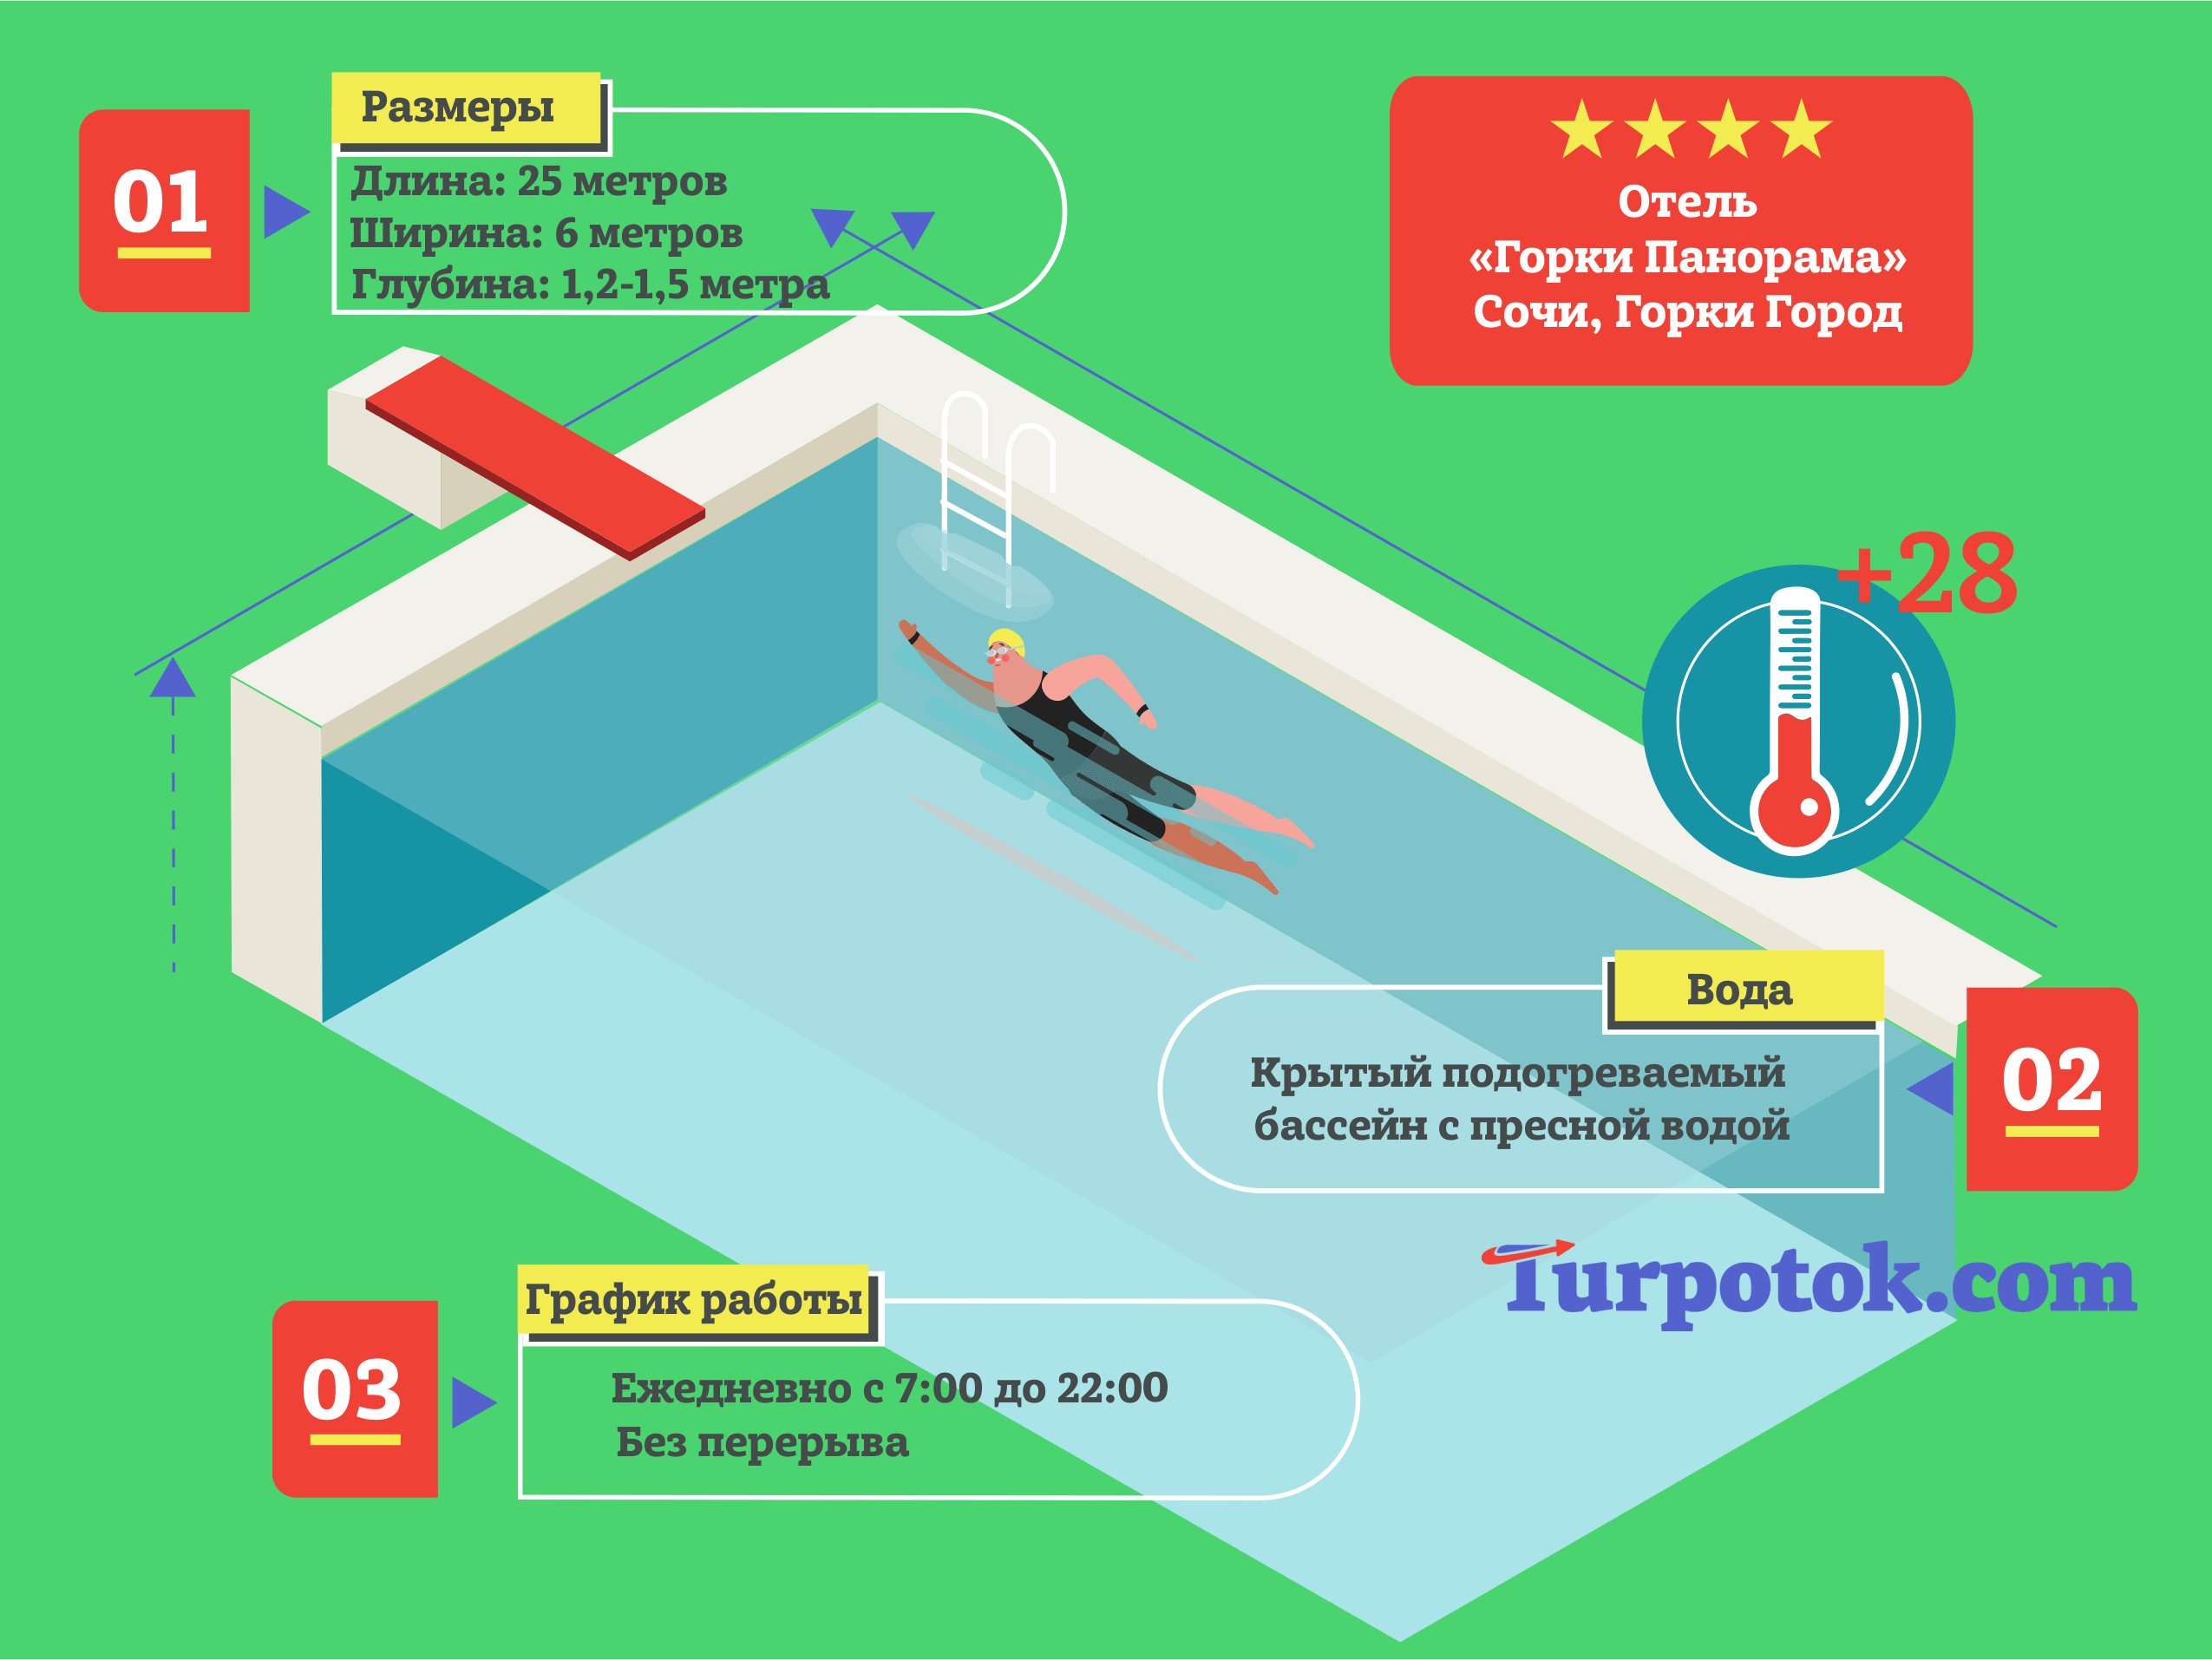 Инфографика про «Горки Панорама» (Сочи)